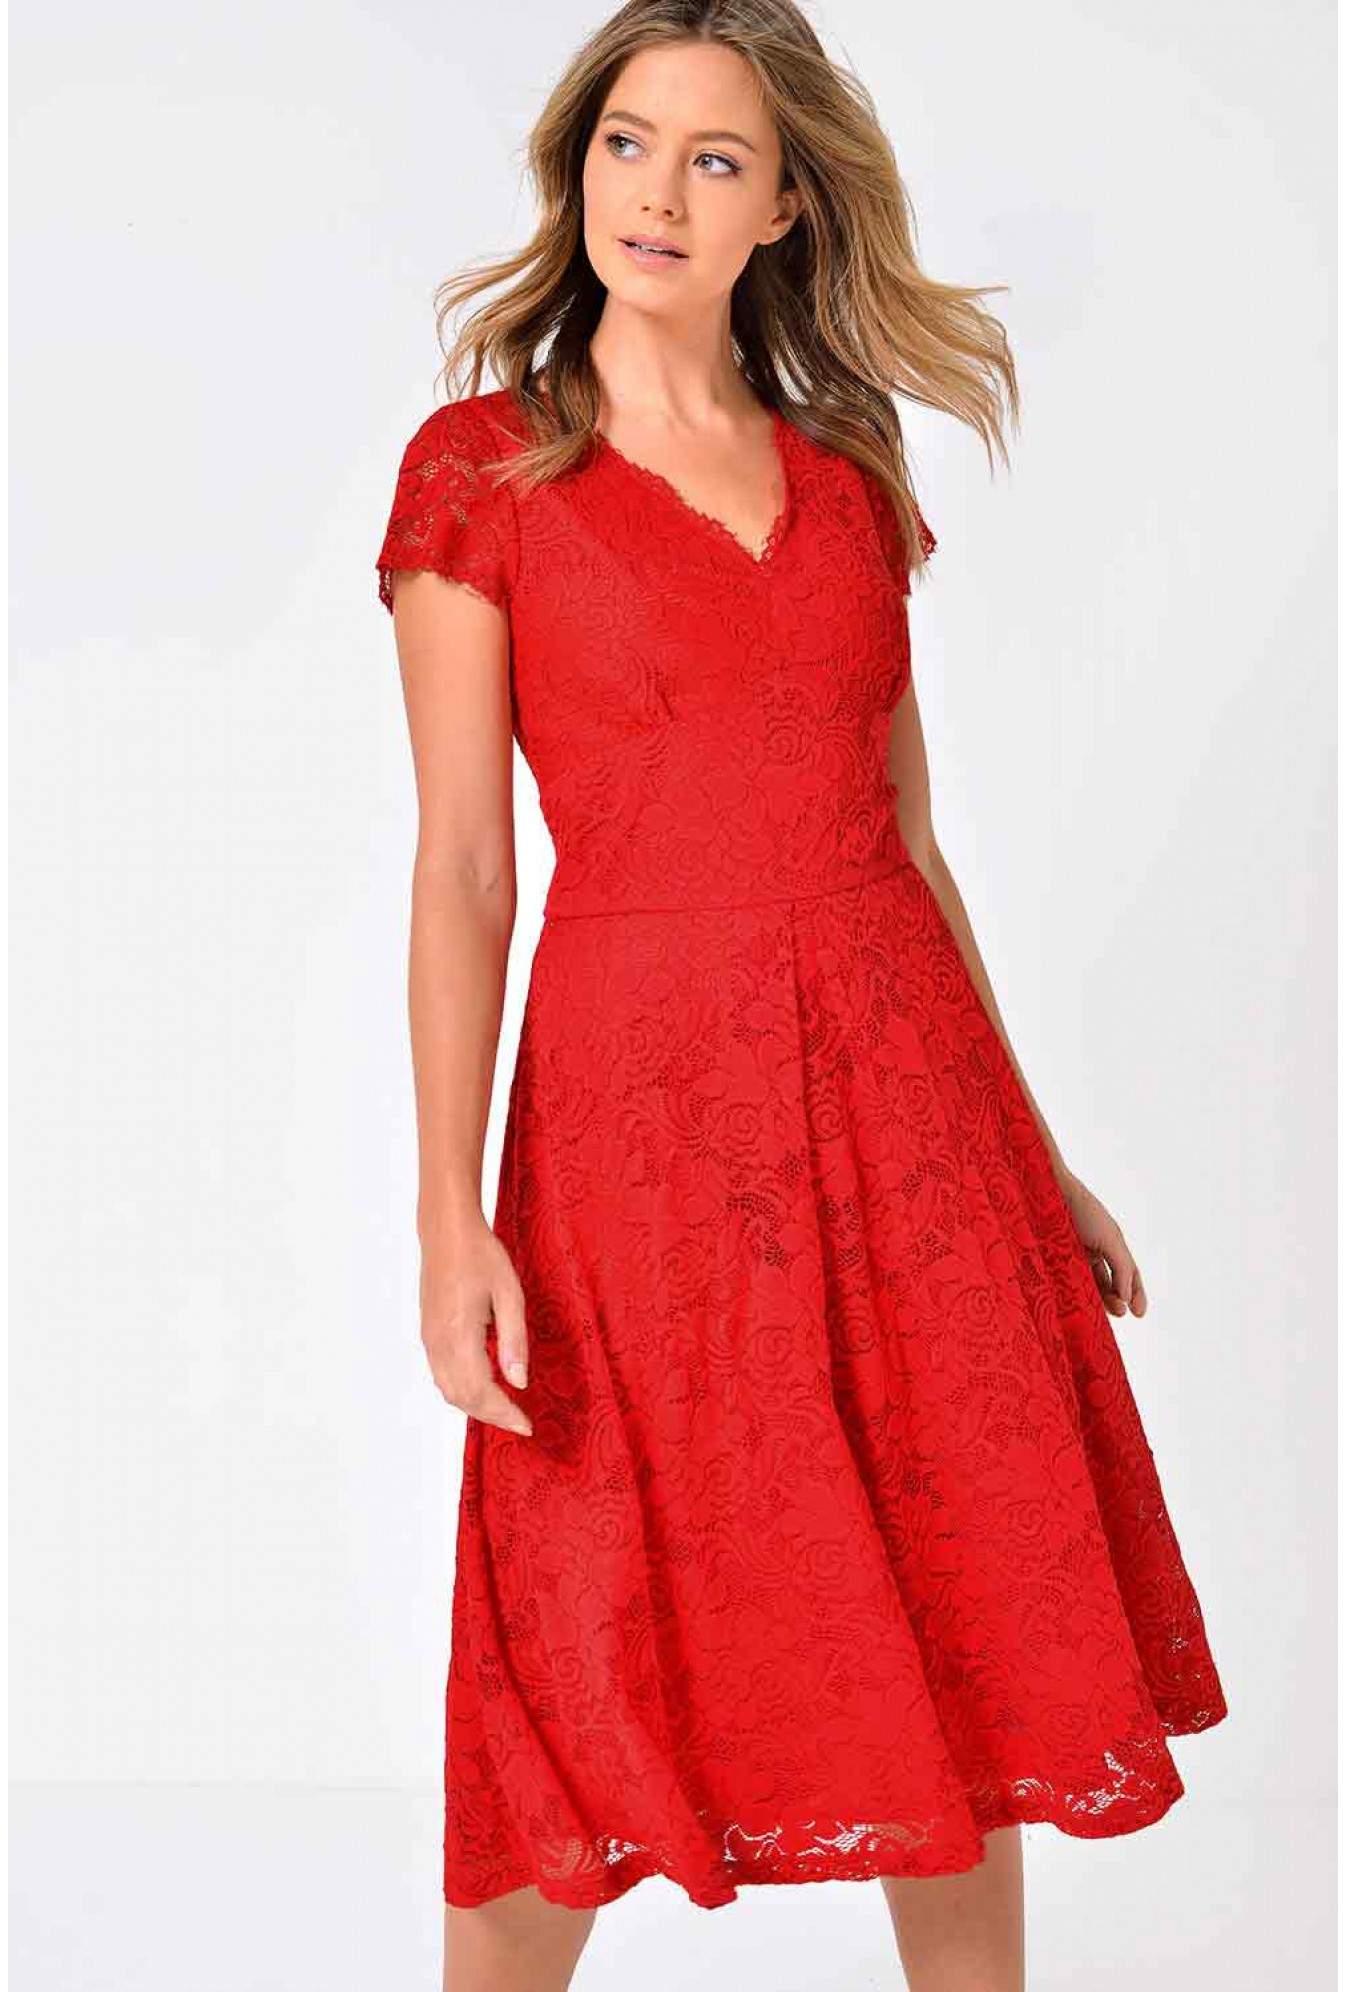 014f7878b51e Marc Angelo Samia Lace Midi Skater Dress in Red